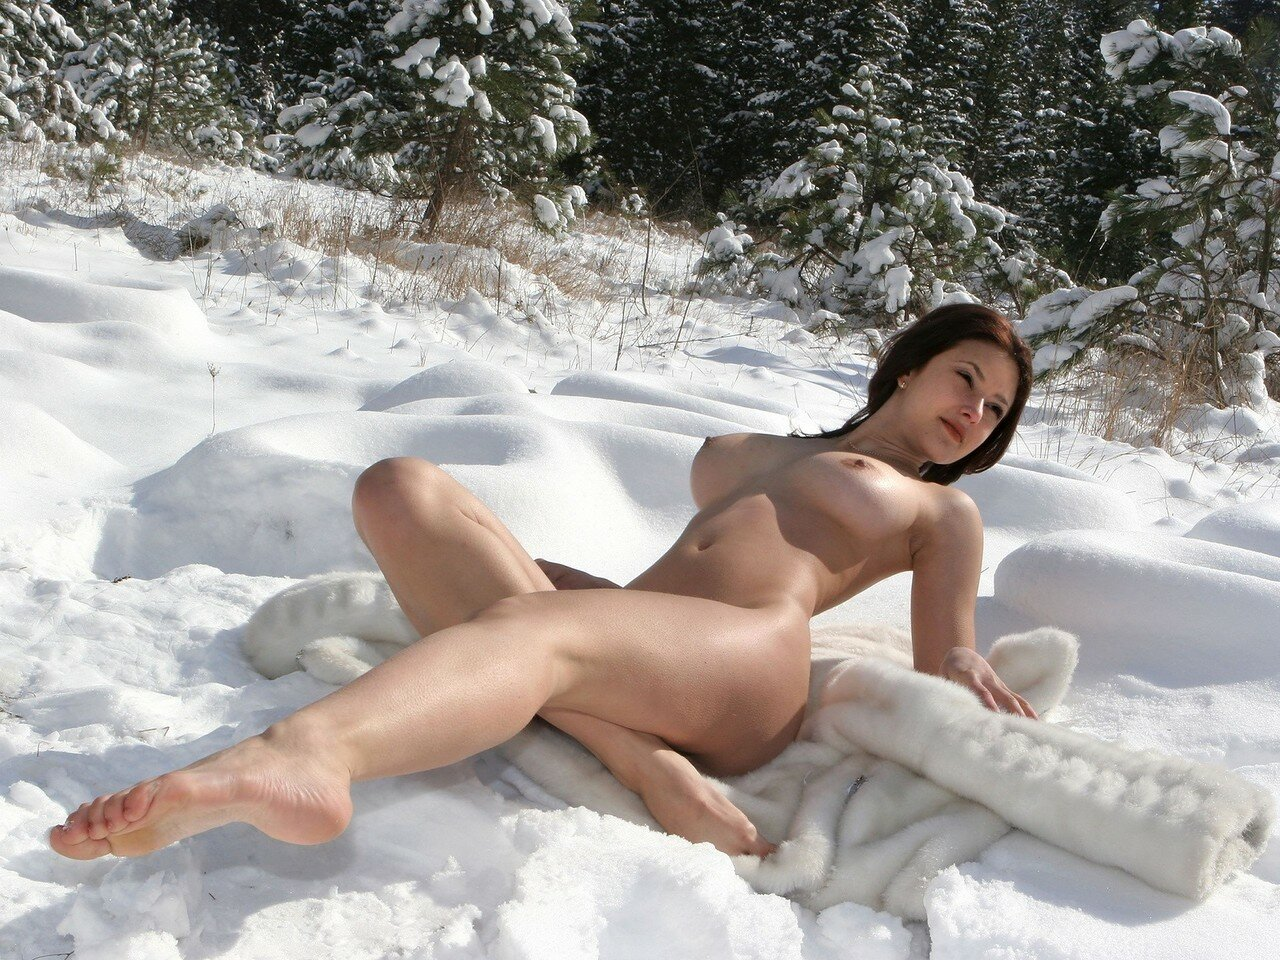 как потаскушки на снегу онлайн сперва мне